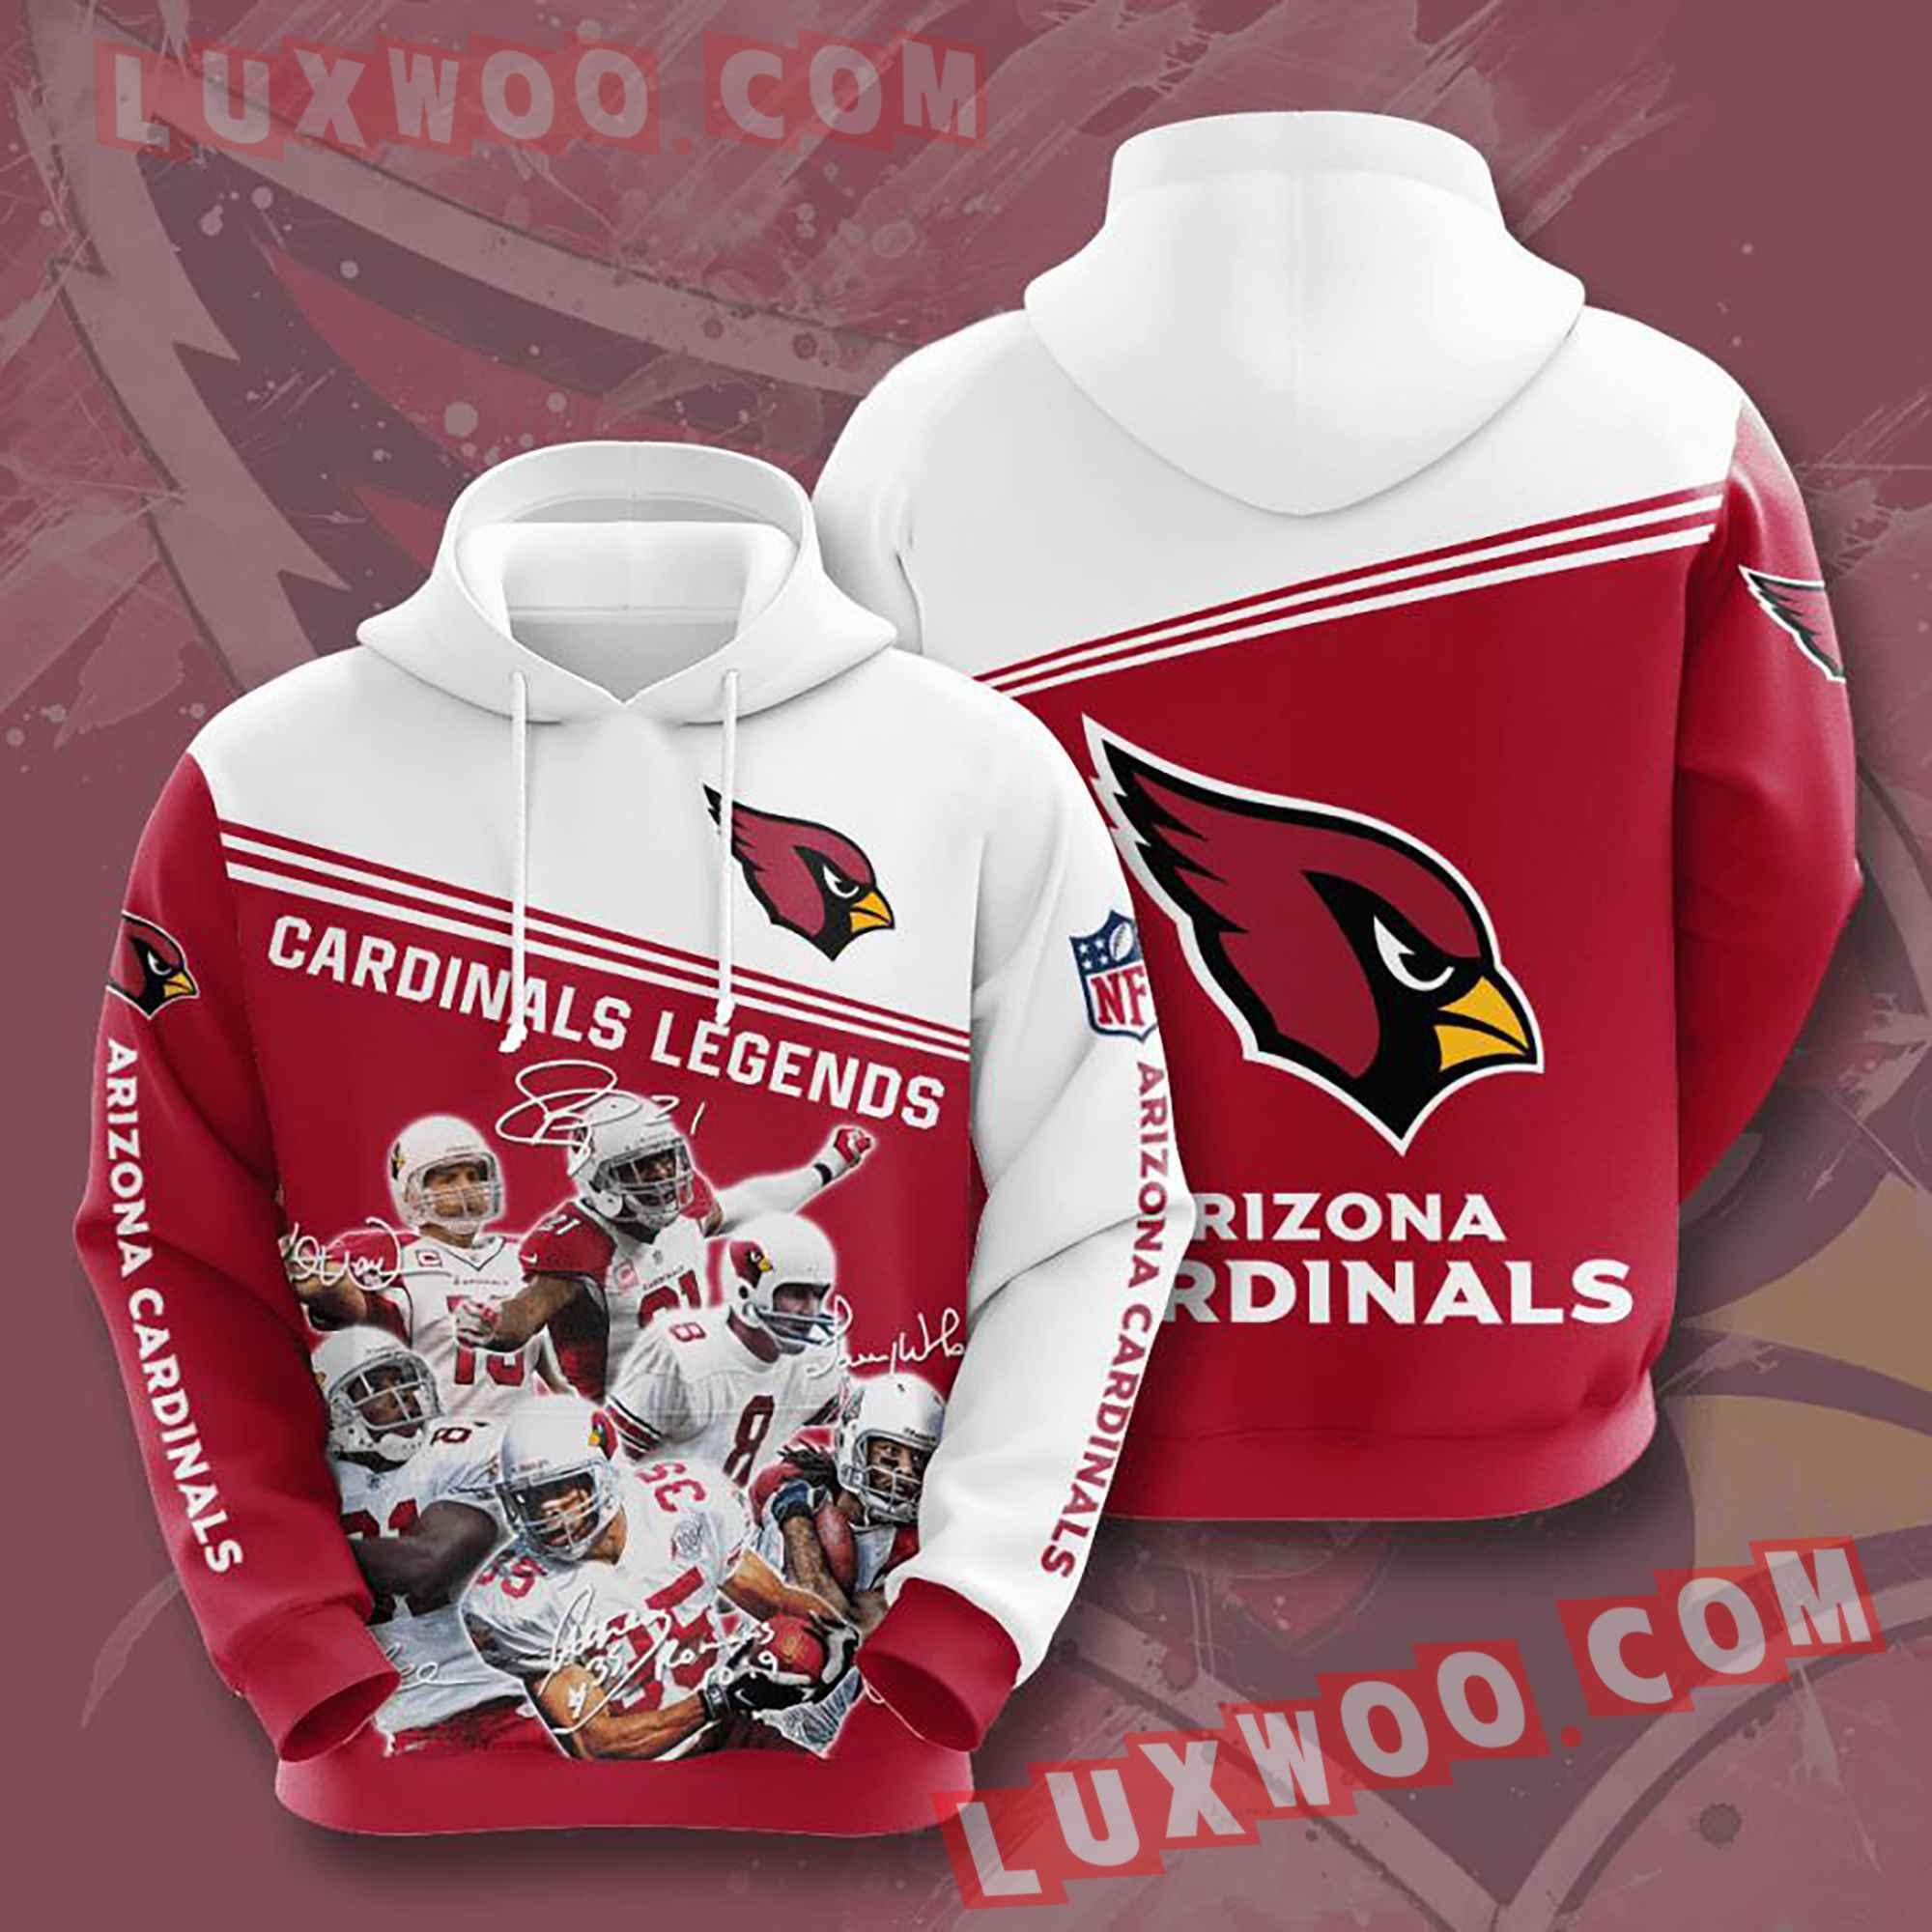 Nfl Arizona Cardinals Hoodies Custom All Over Print 3d Pullover Hoodie V21